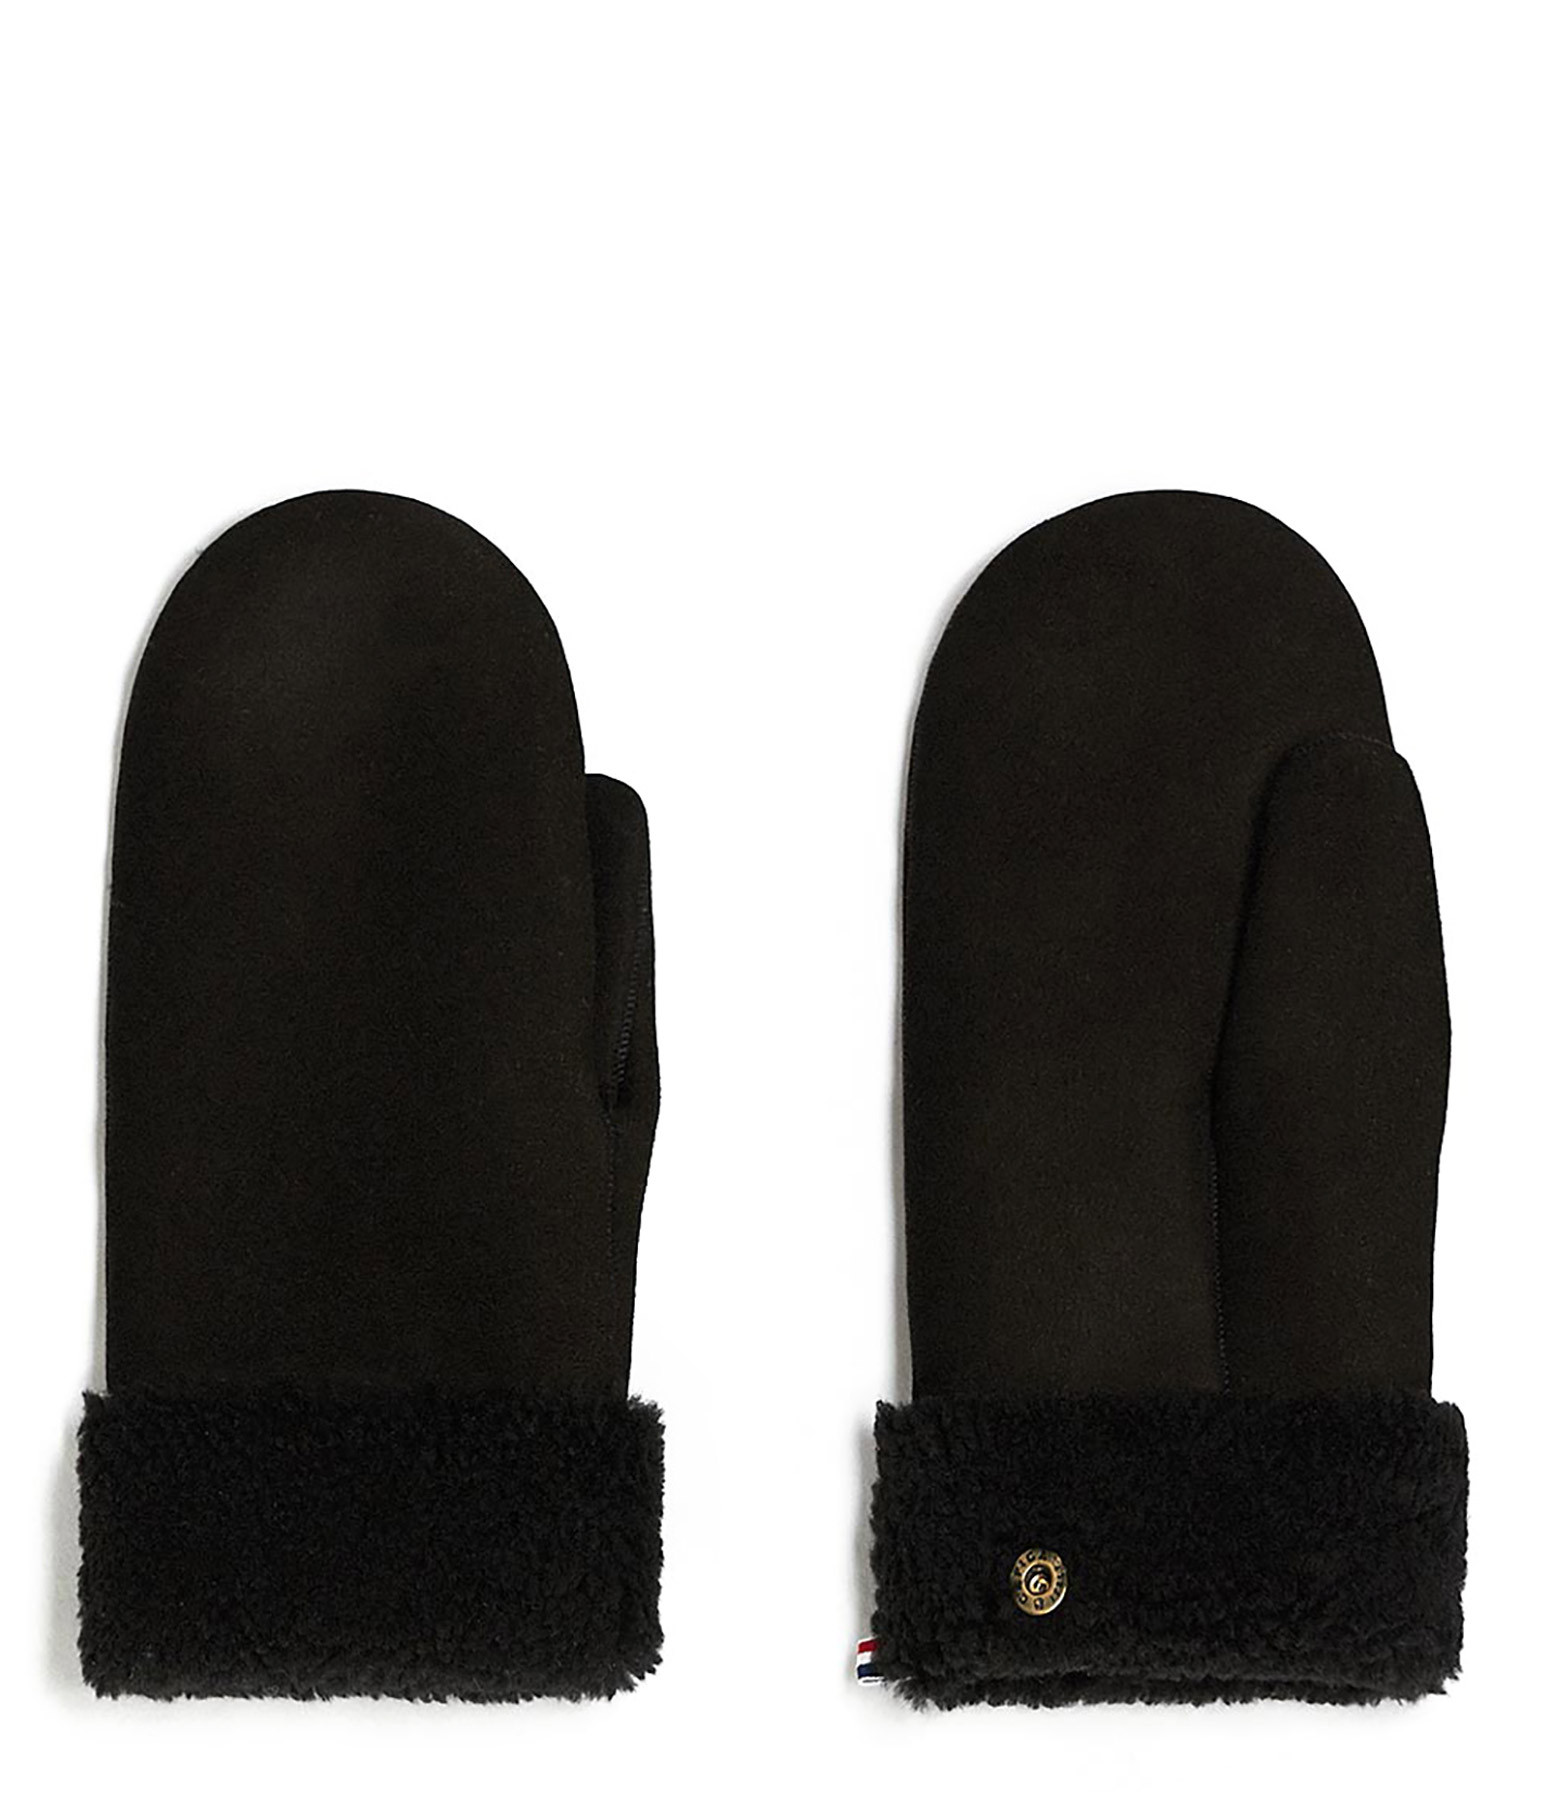 TOASTIES - Moufles Noir